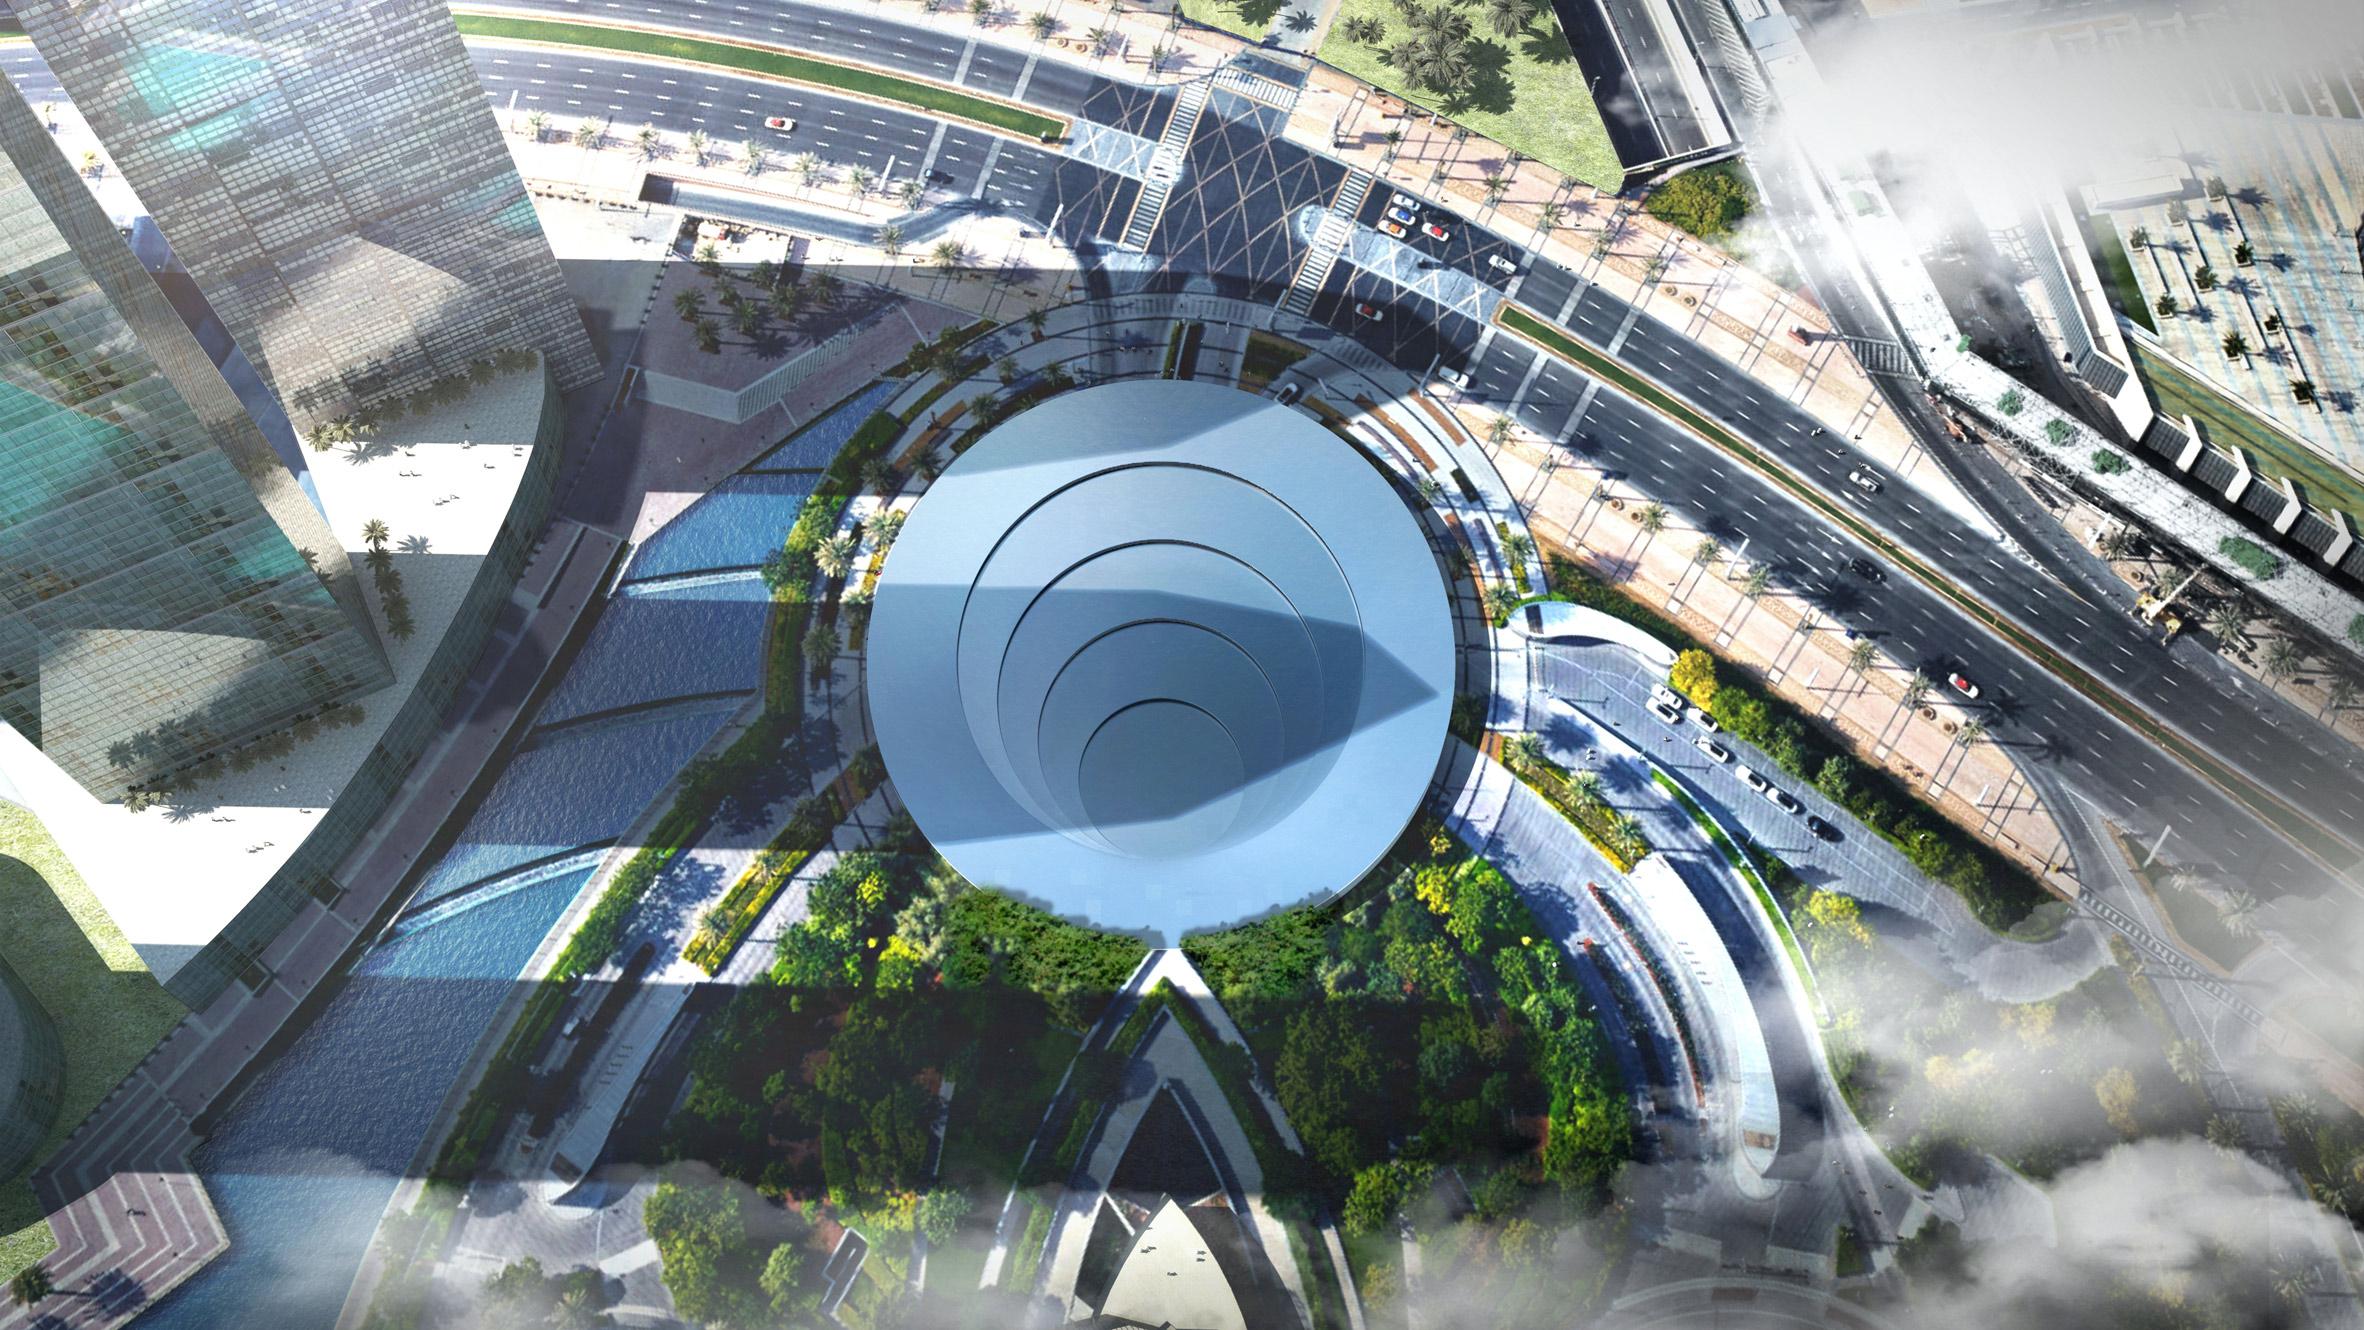 BIG reveals full designs for Dubai Hyperloop in new video